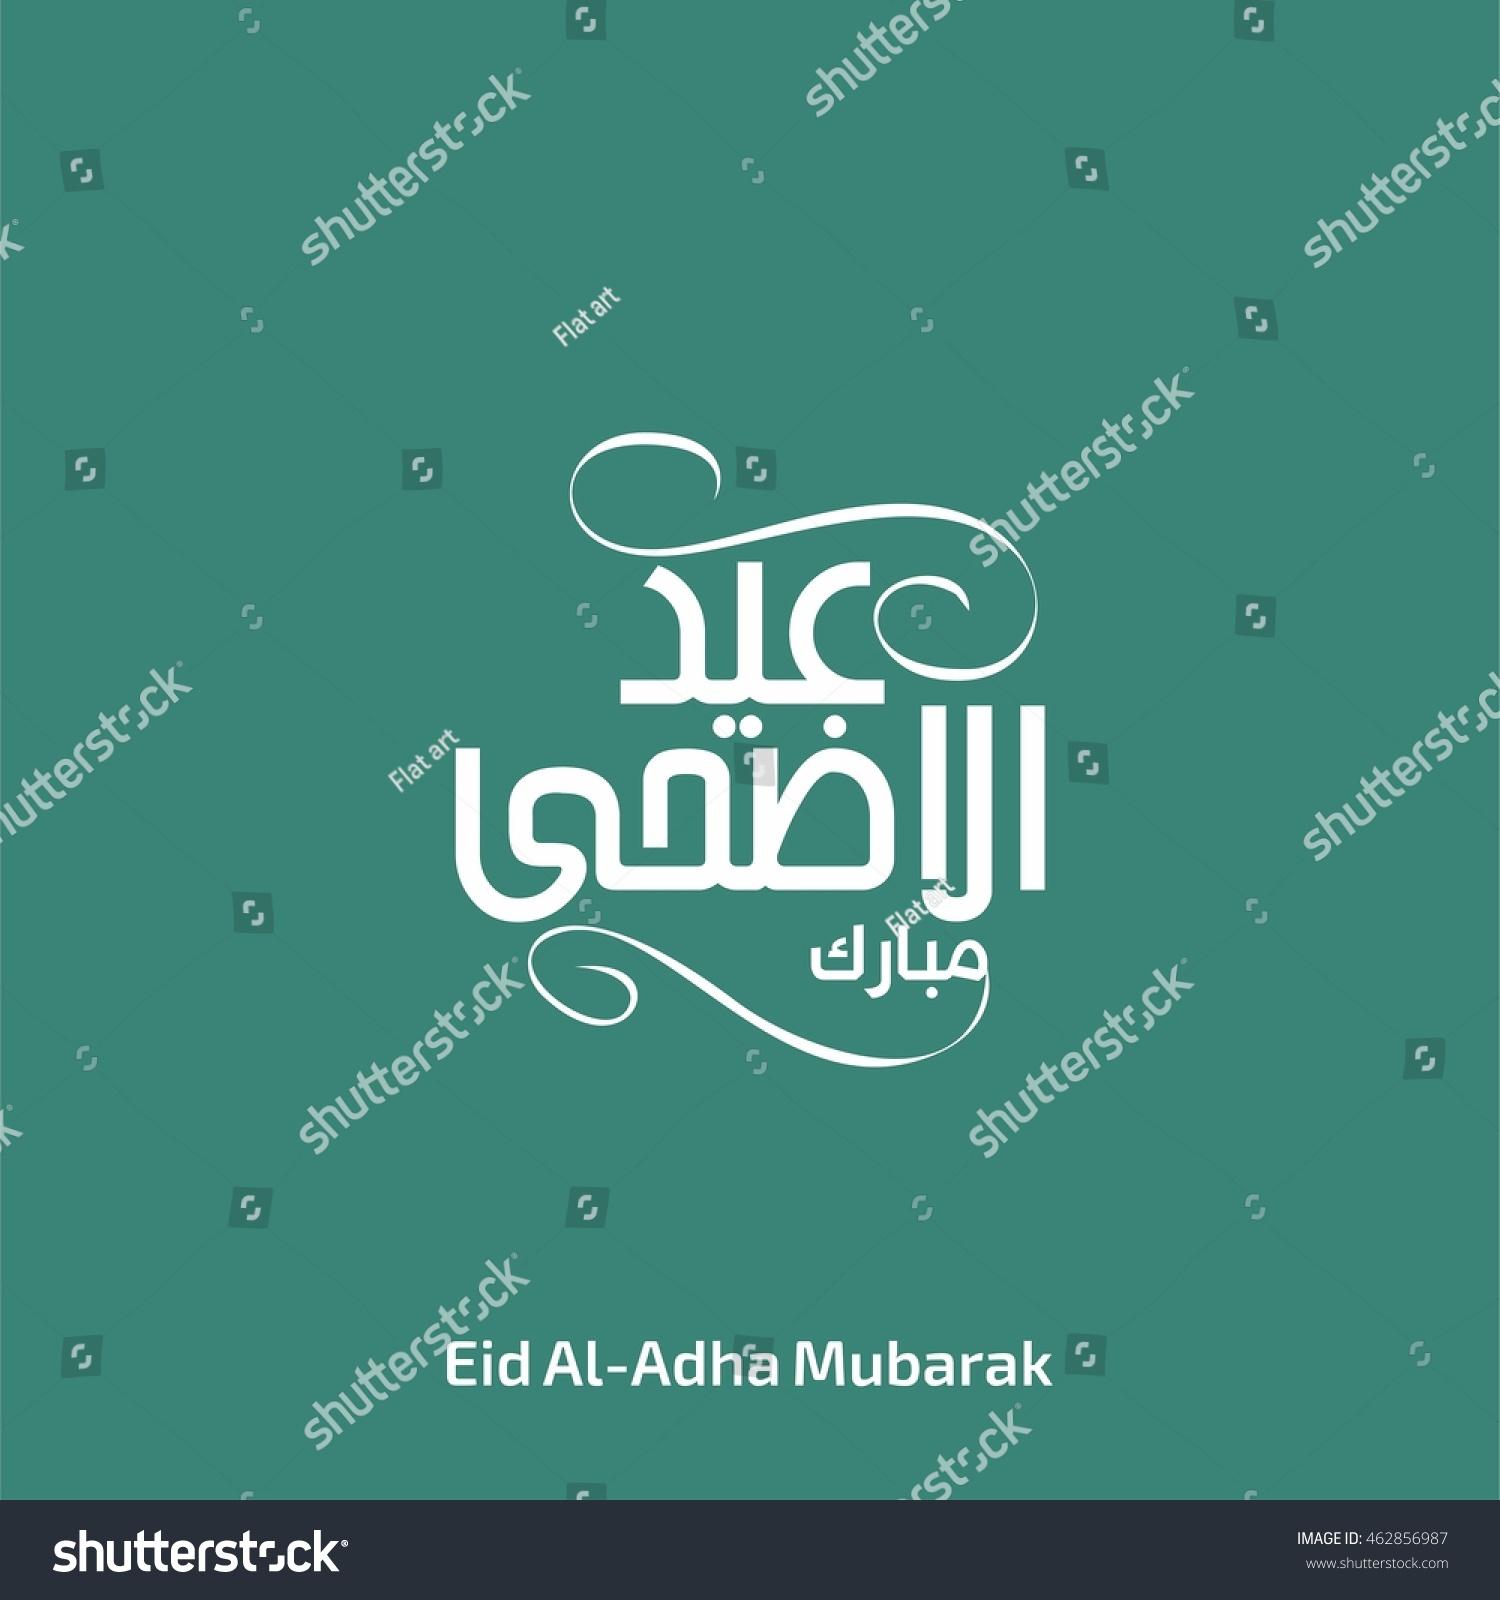 Eid Al Adha Arabic Urdu Calligraphy Stock Vector Royalty Free